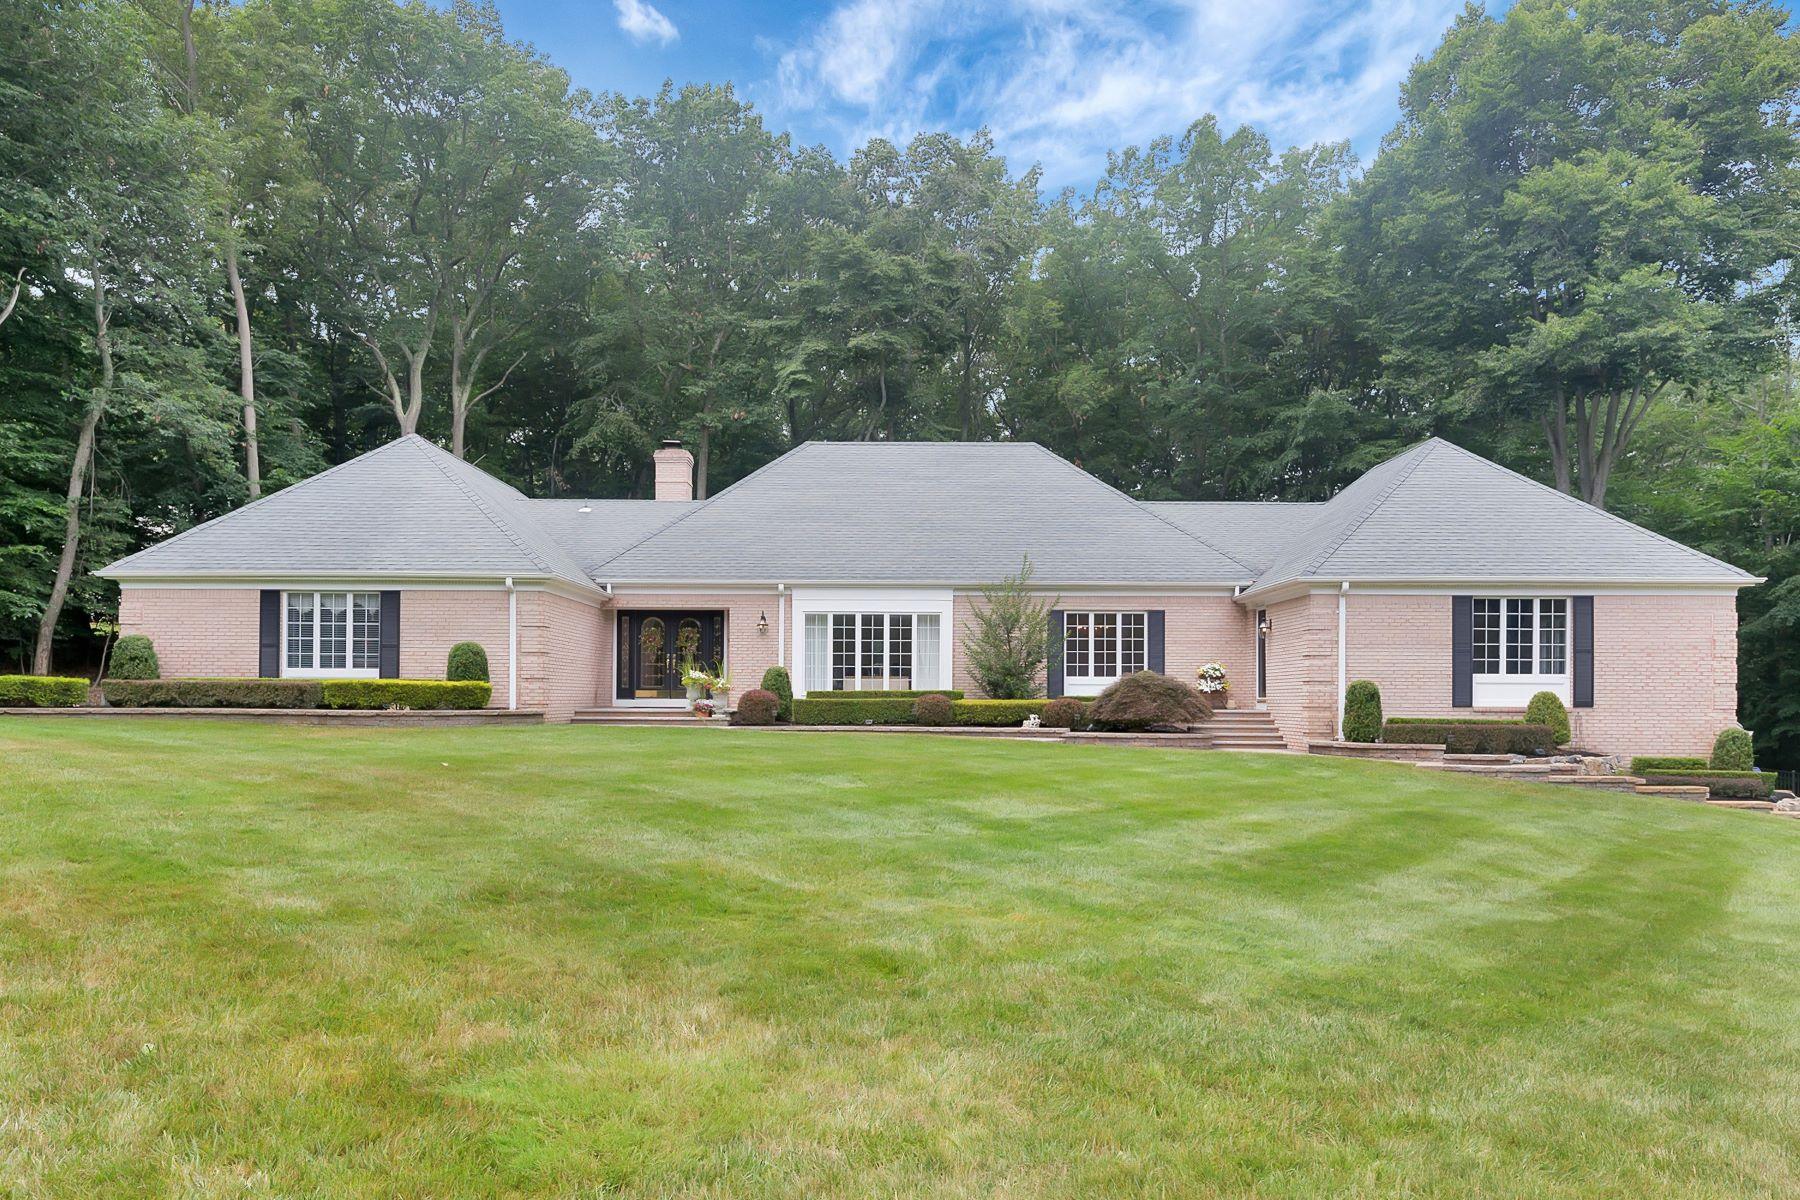 Casa para uma família para Venda às Gorgeous Stately Ranch 16 Deep Wood Lane Colts Neck, Nova Jersey, 07722 Estados Unidos